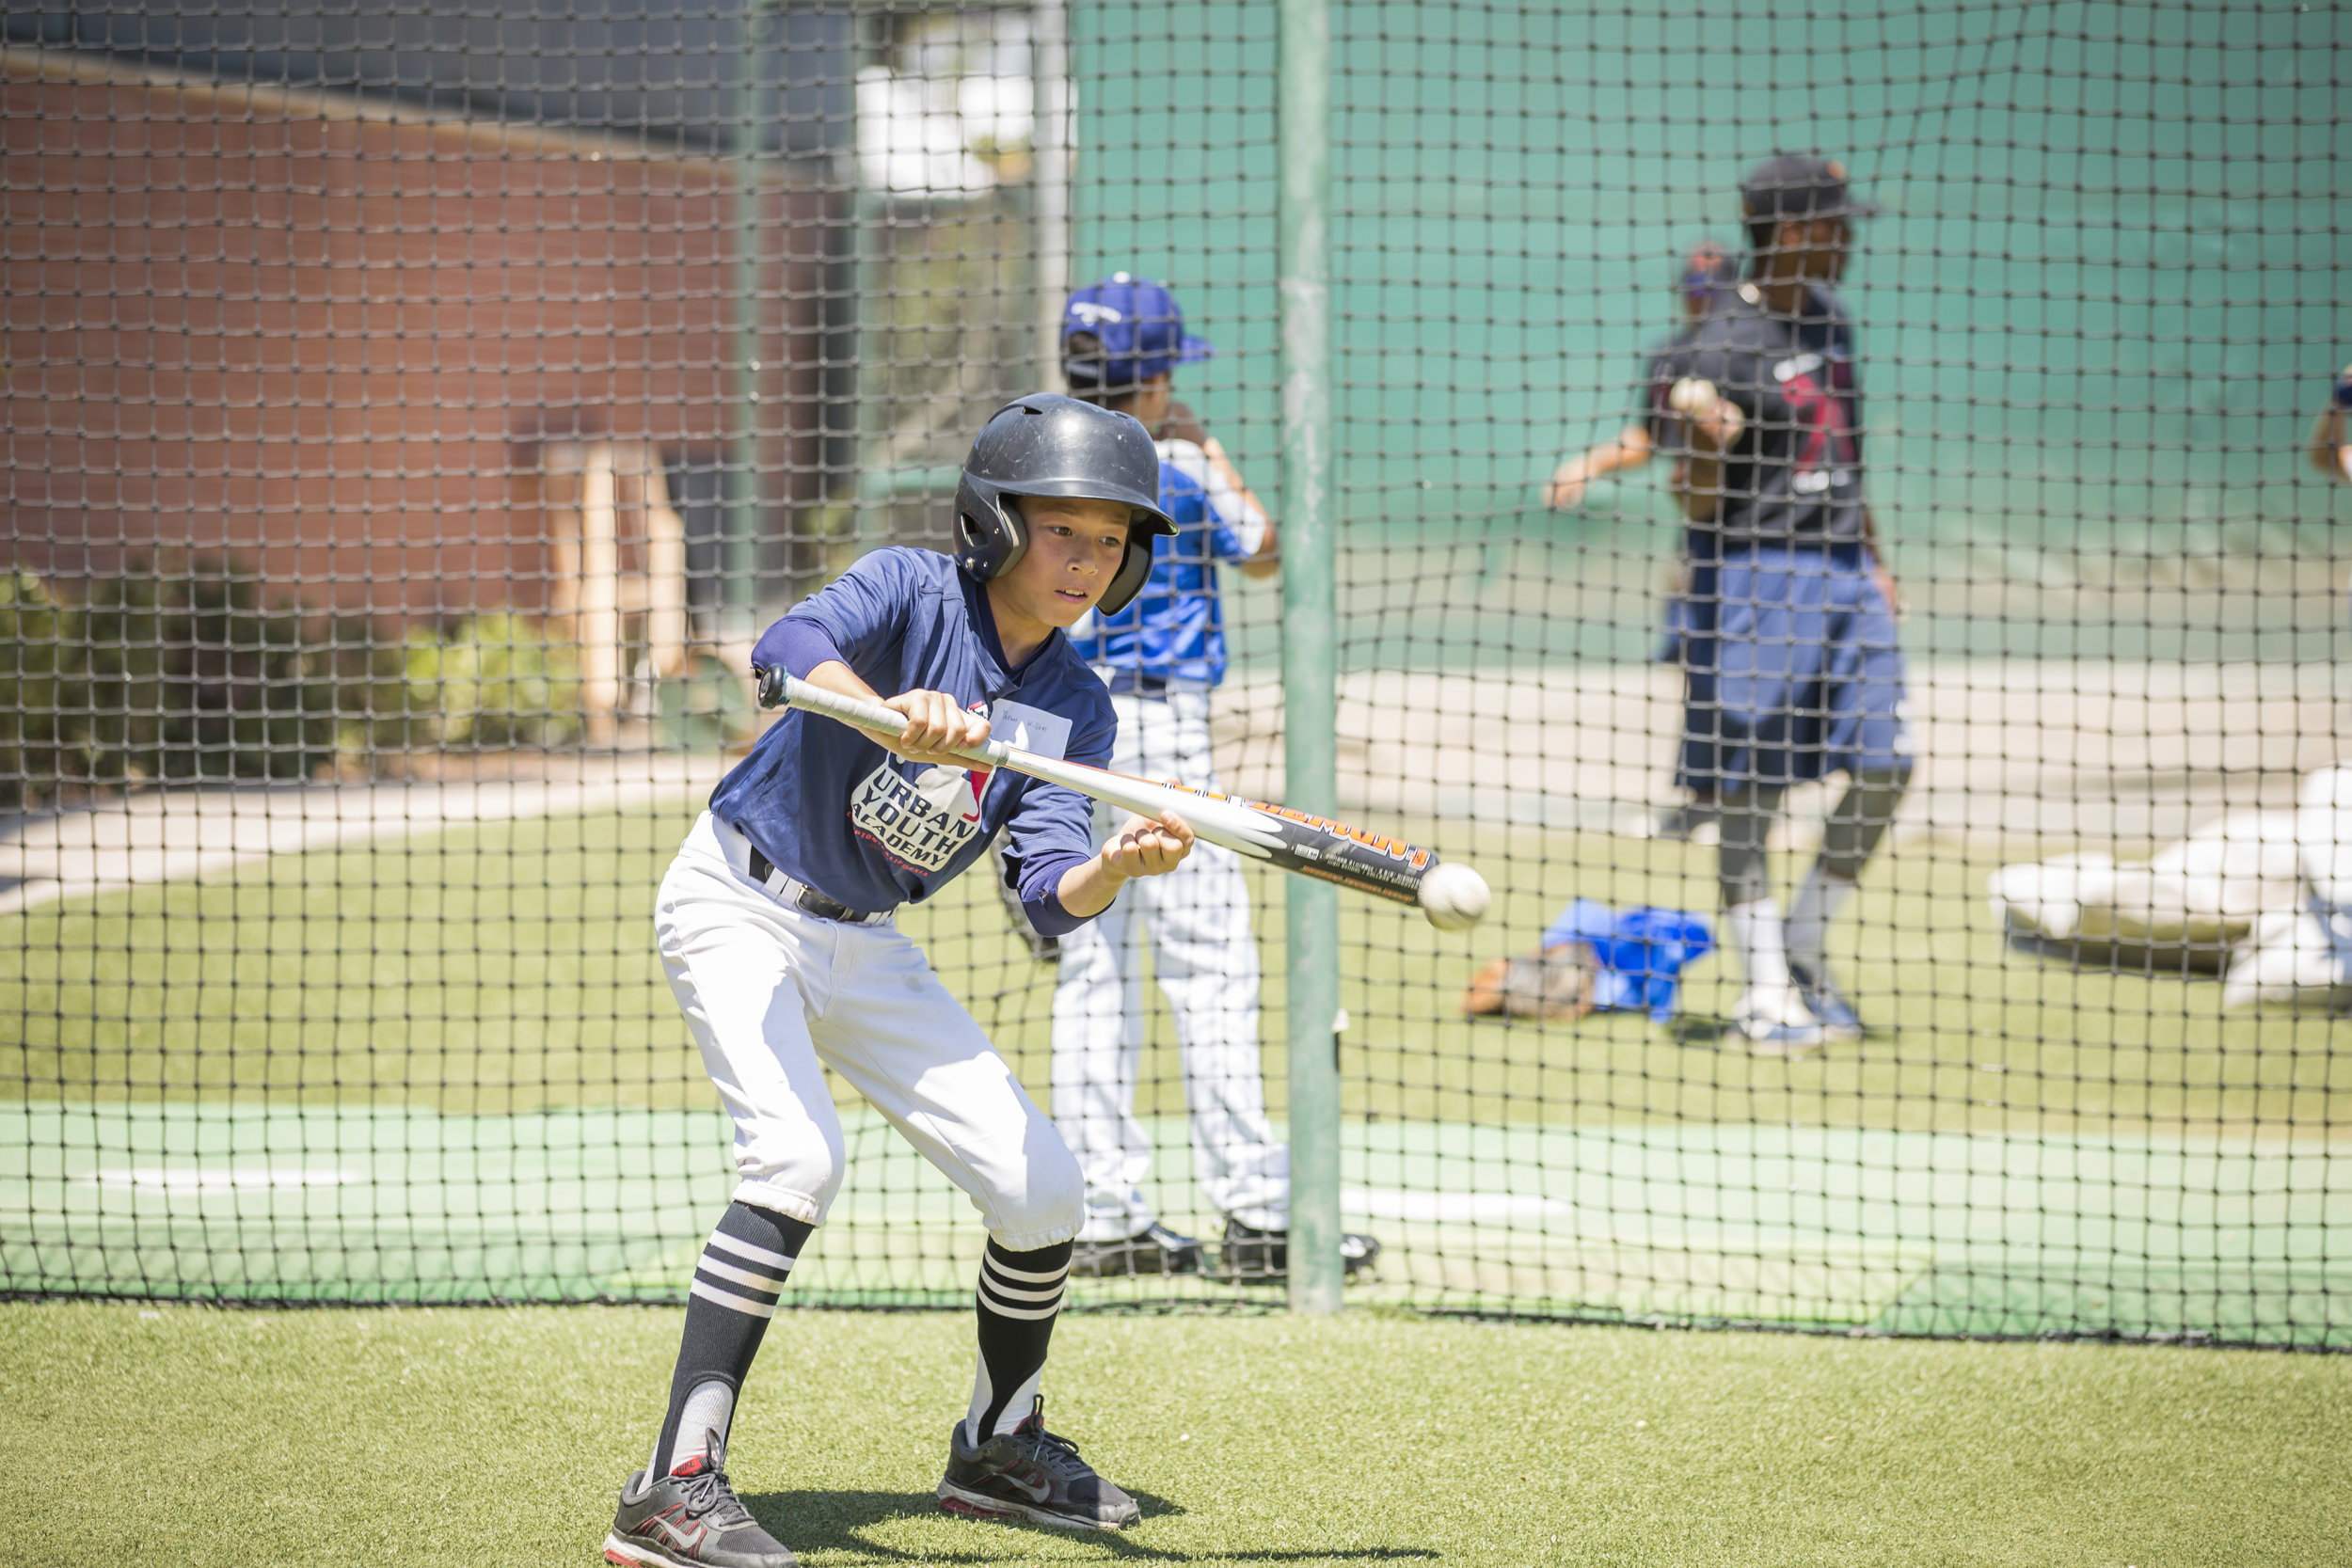 2017_JUNE_BASEBALL_CAMP_BKEENEPHOTO-163.jpg